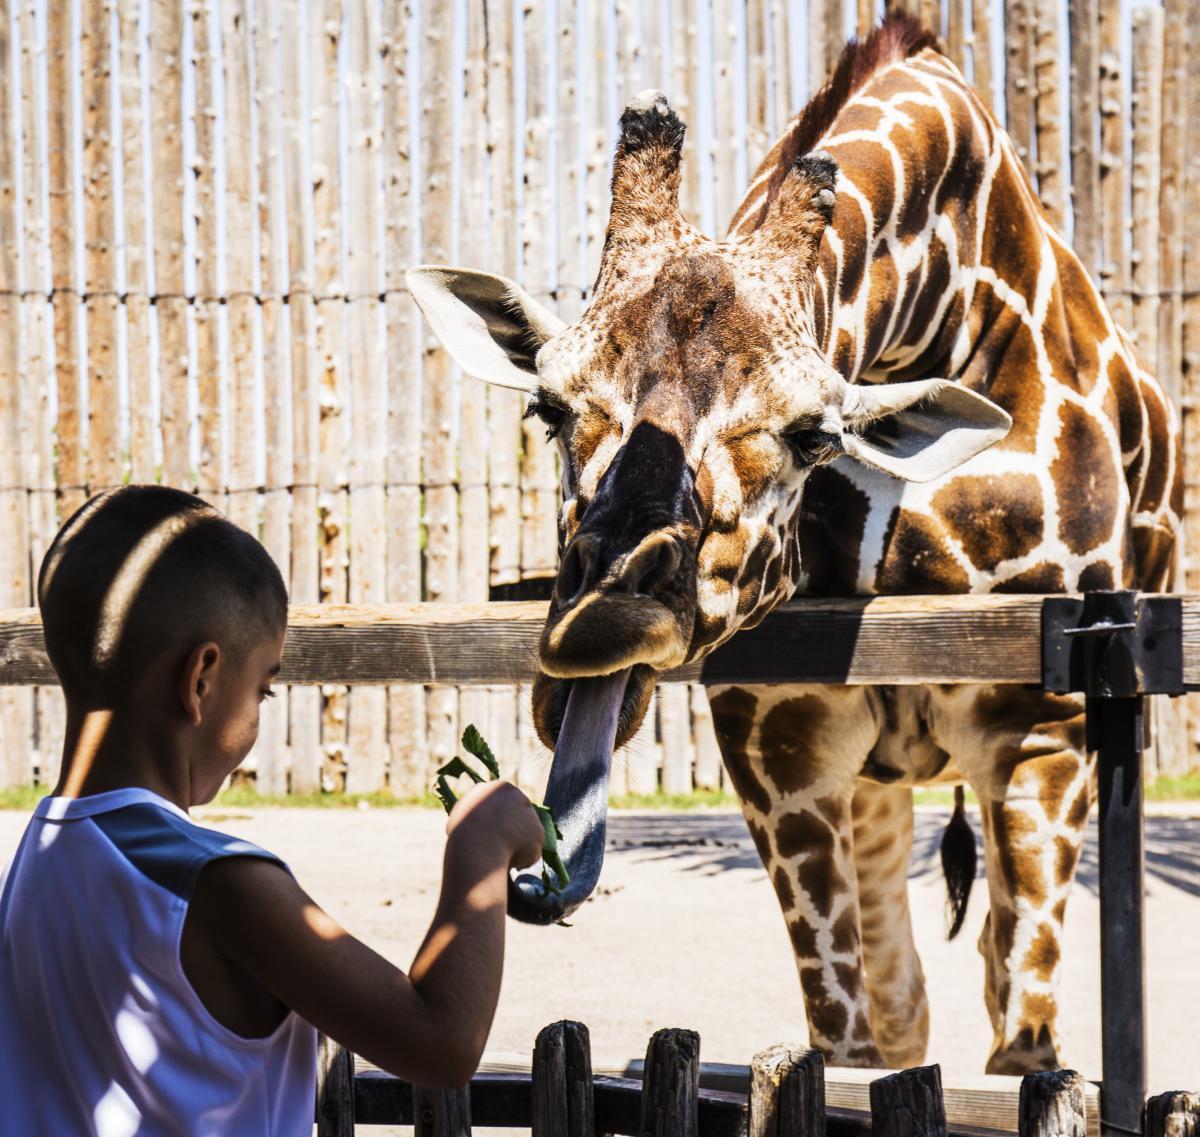 Boy at Zoo with Giraffe Family Kids